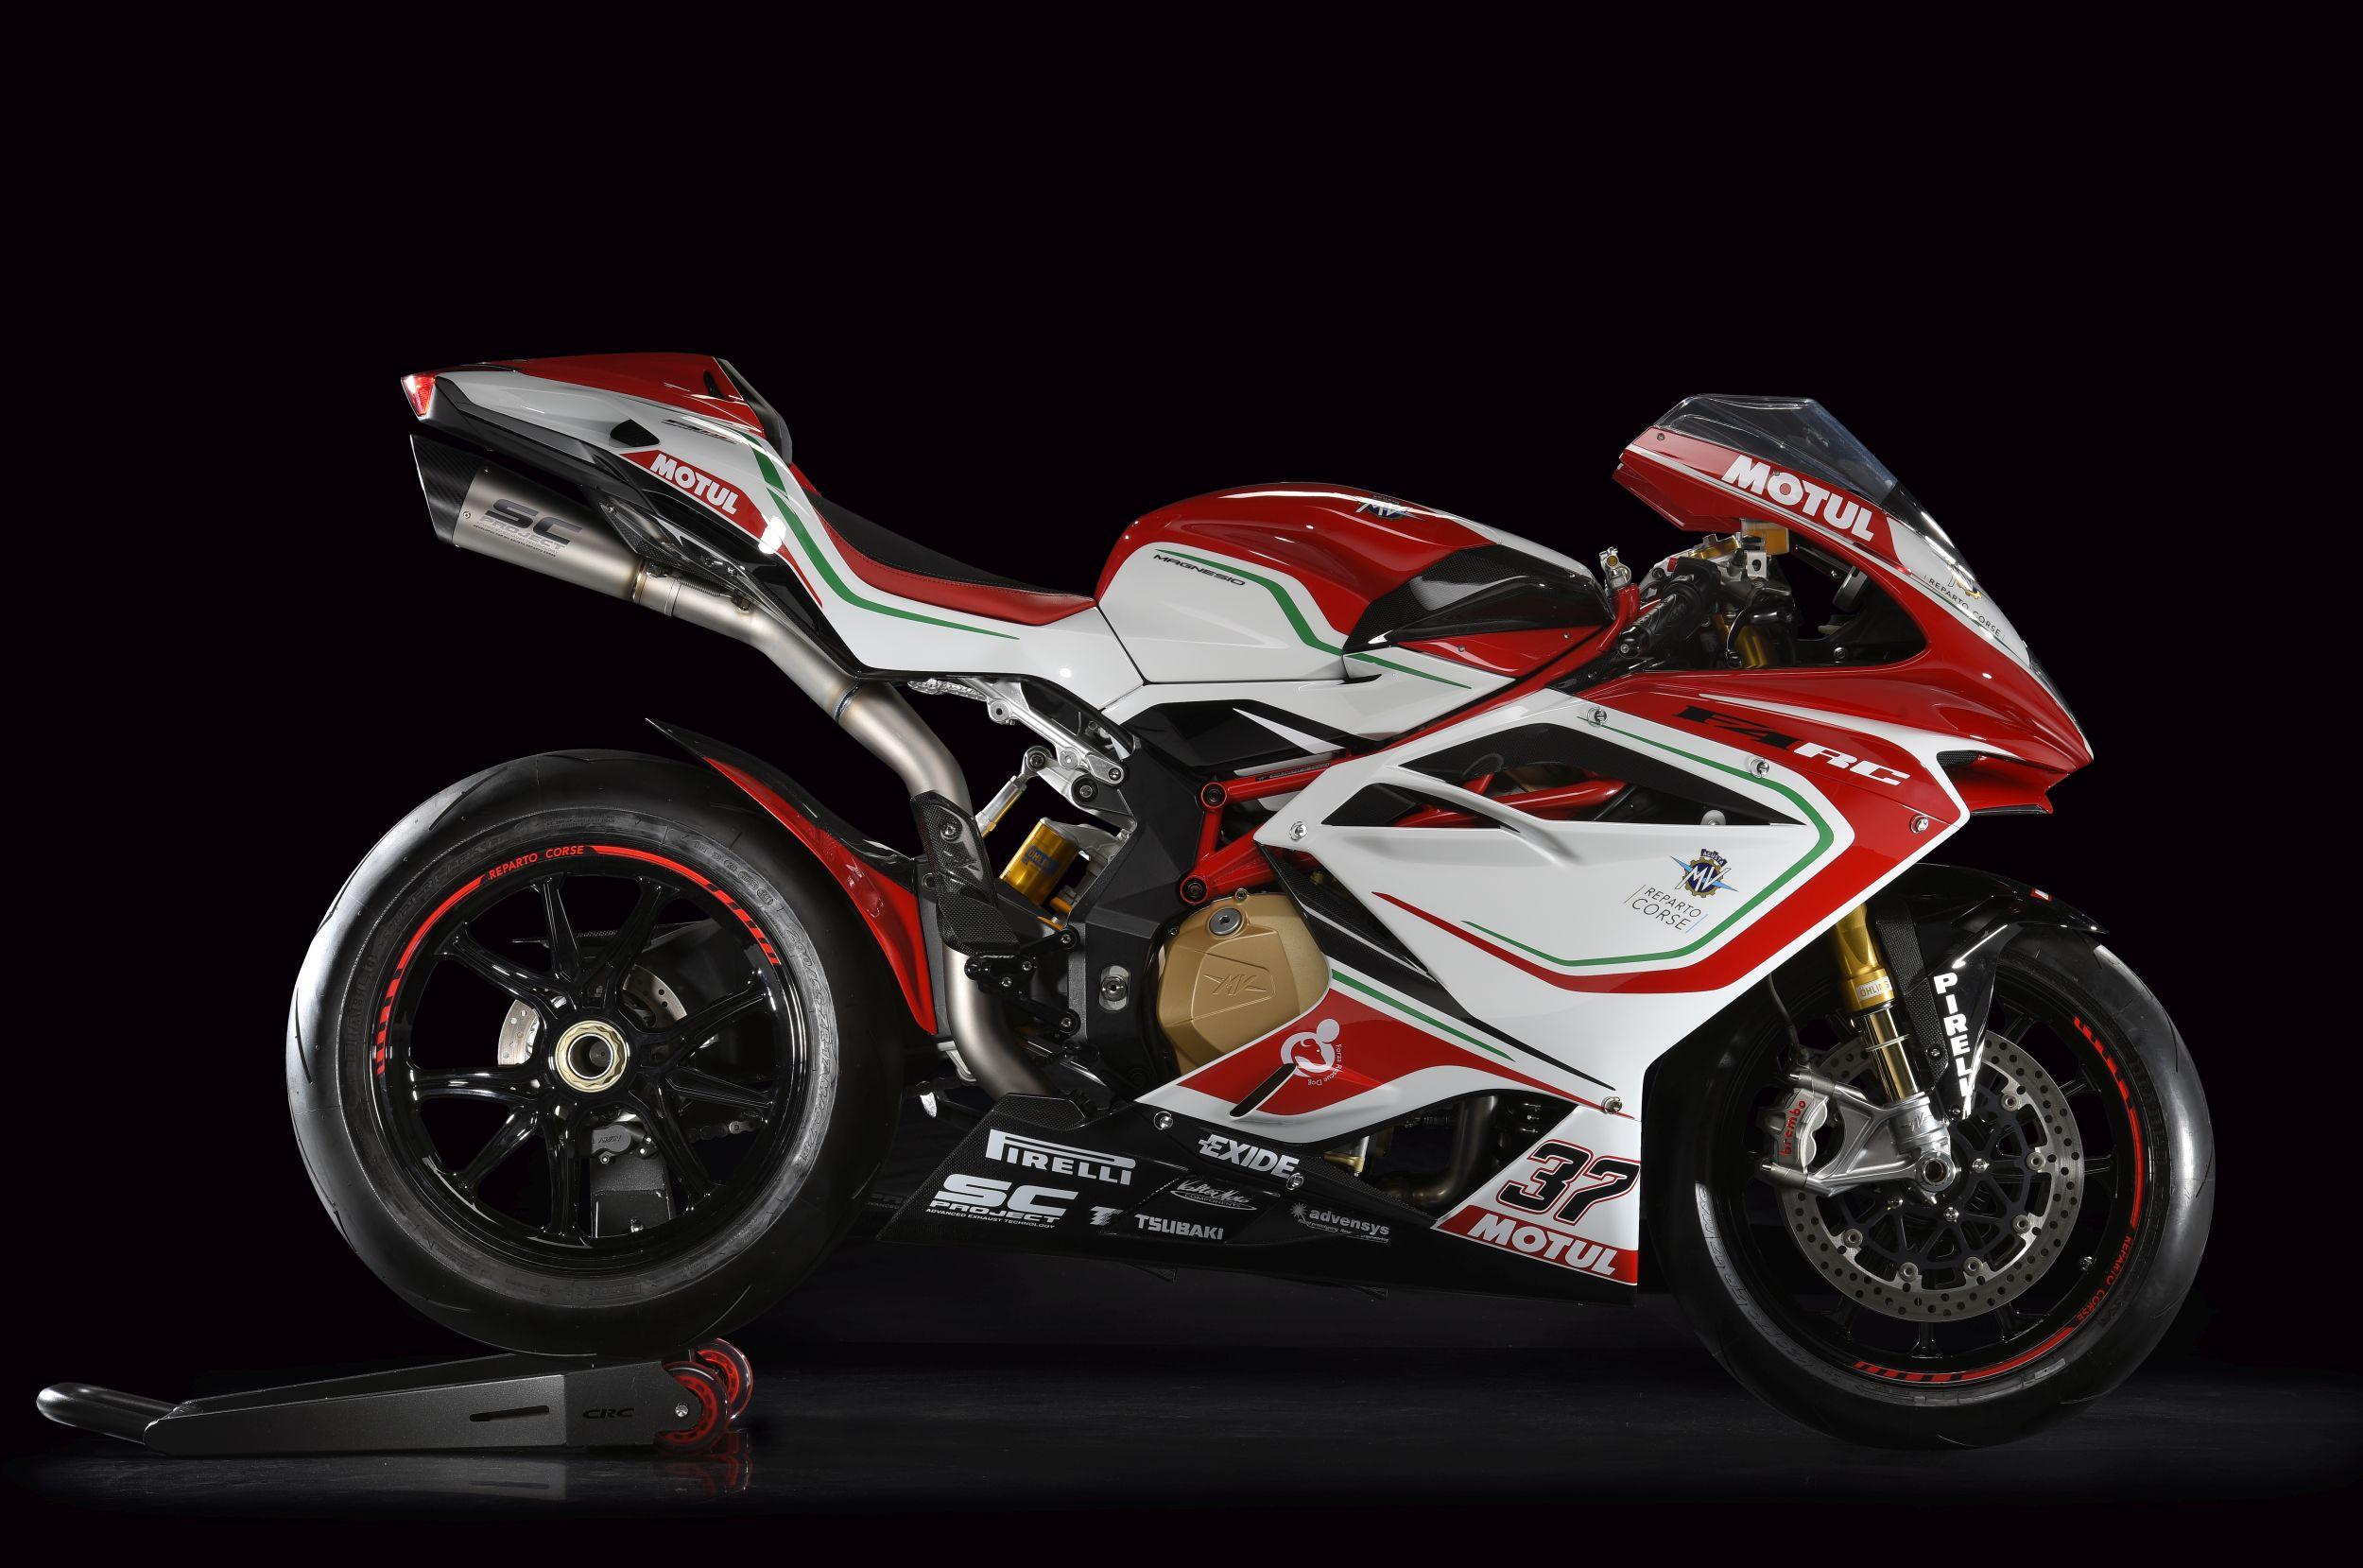 Ducati Panigale Engine Tuning